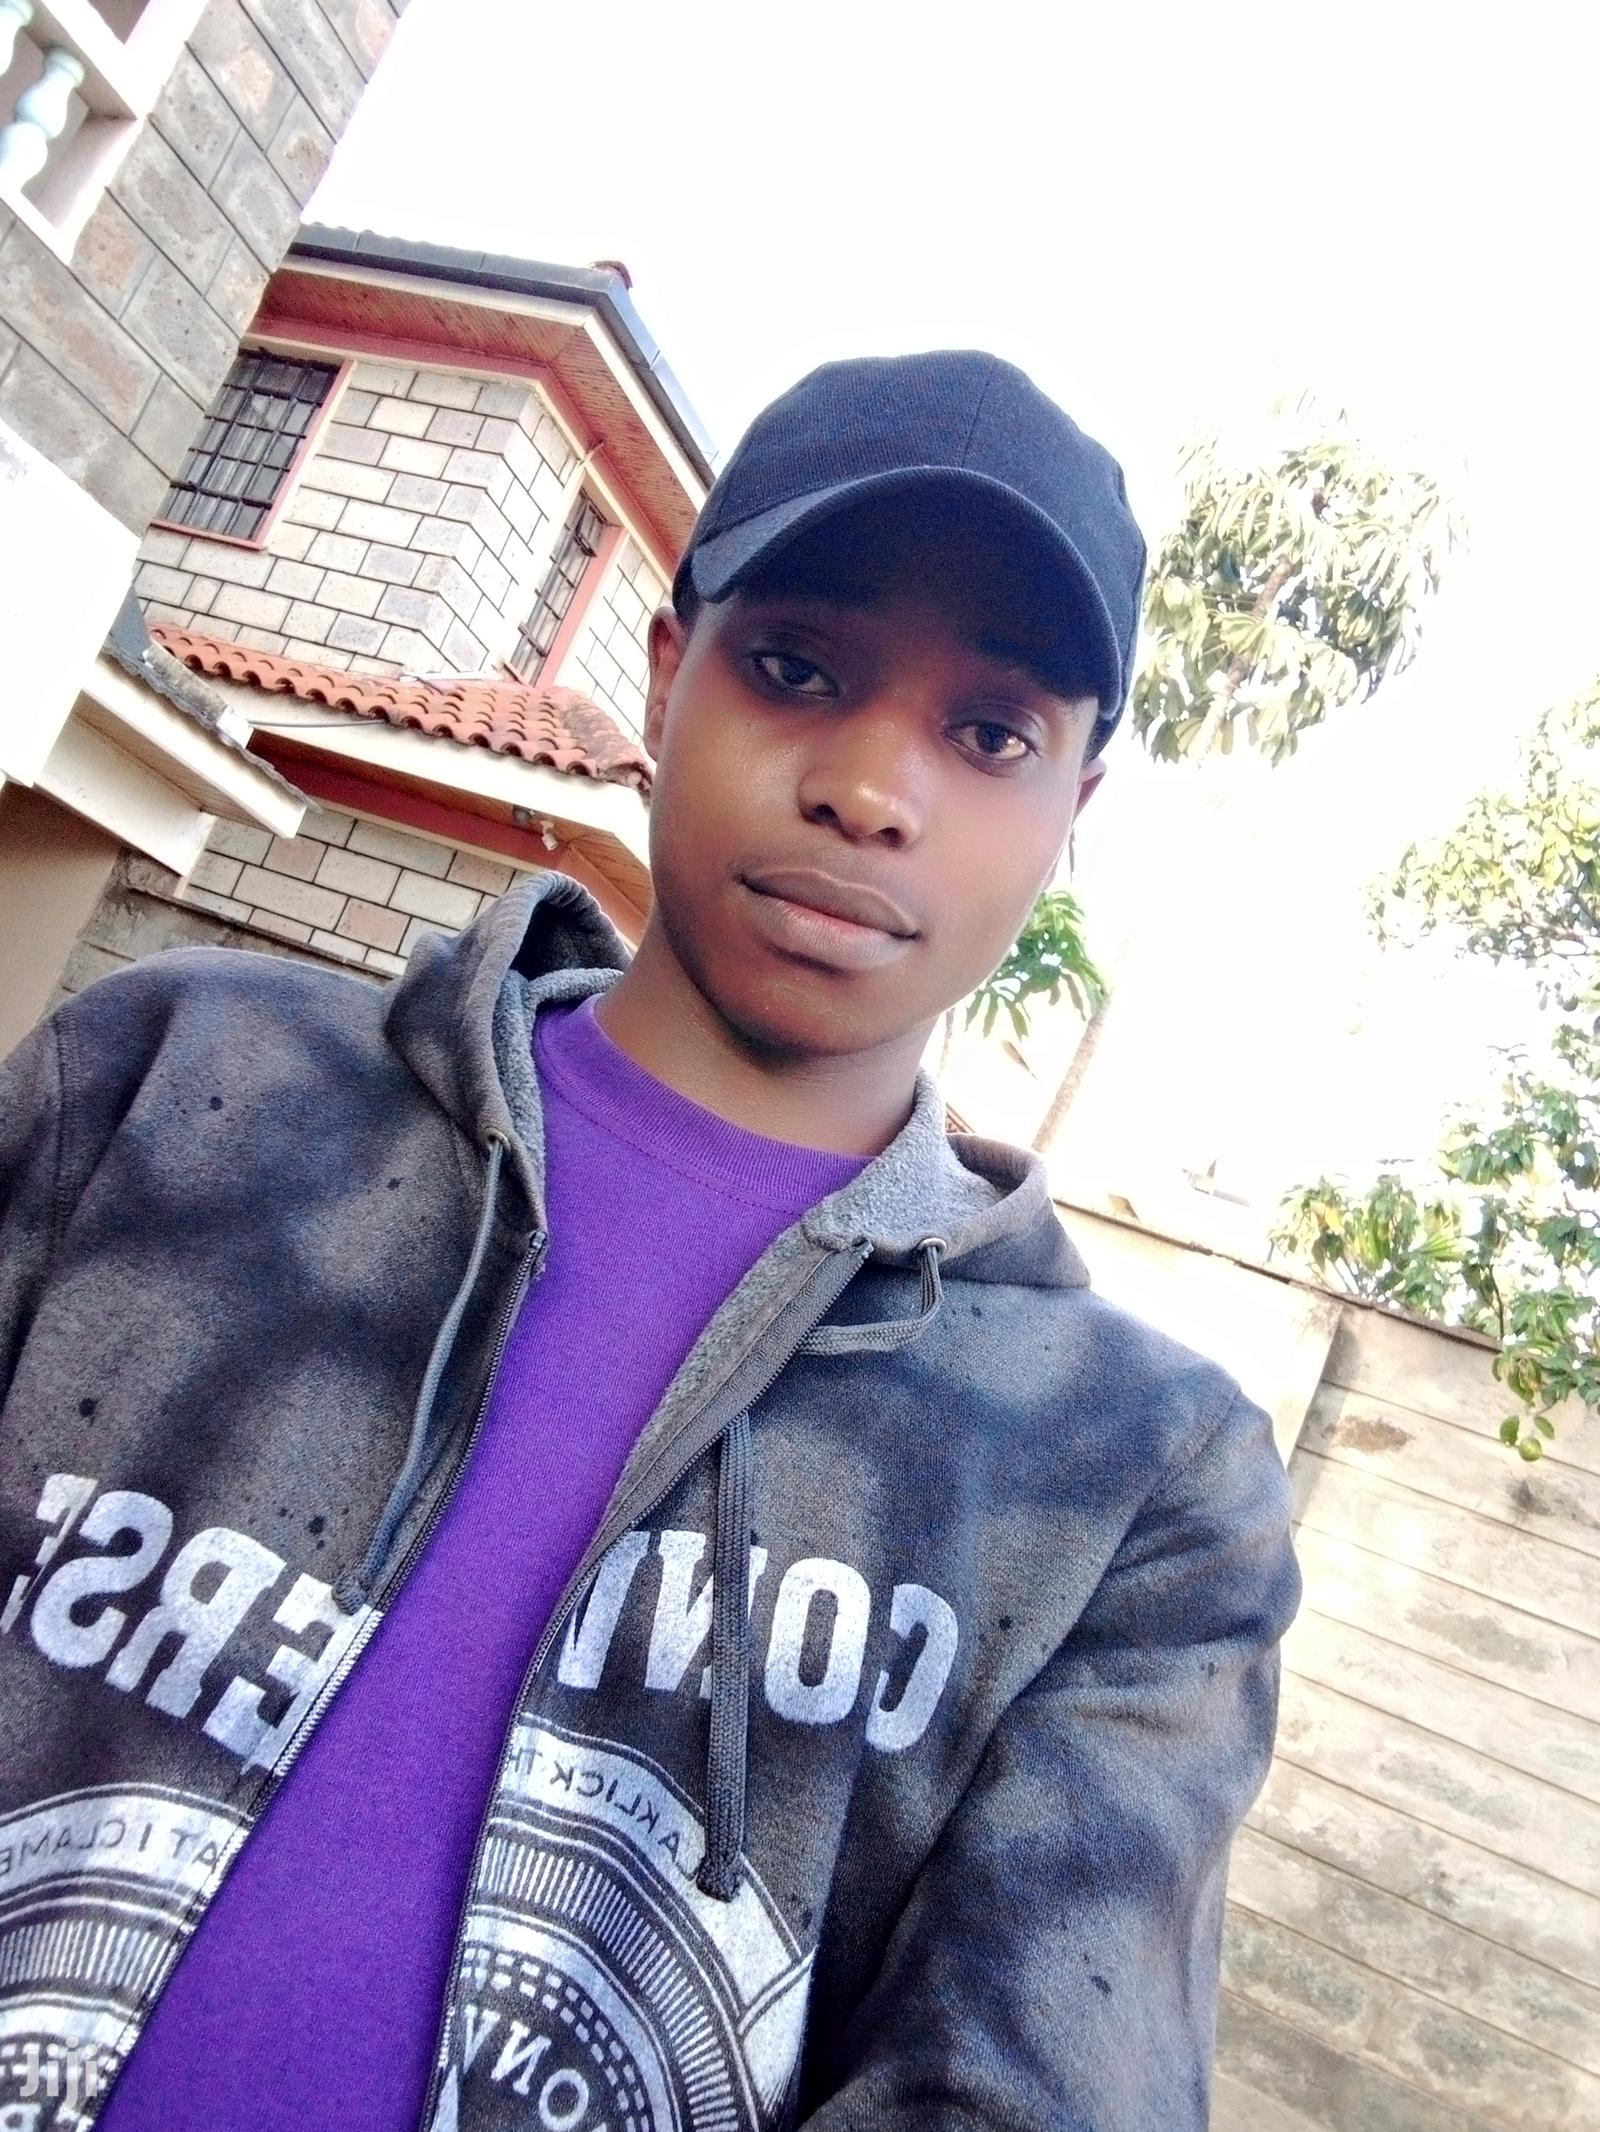 Personal Driver | Driver CVs for sale in Ruiru, Kiambu, Kenya